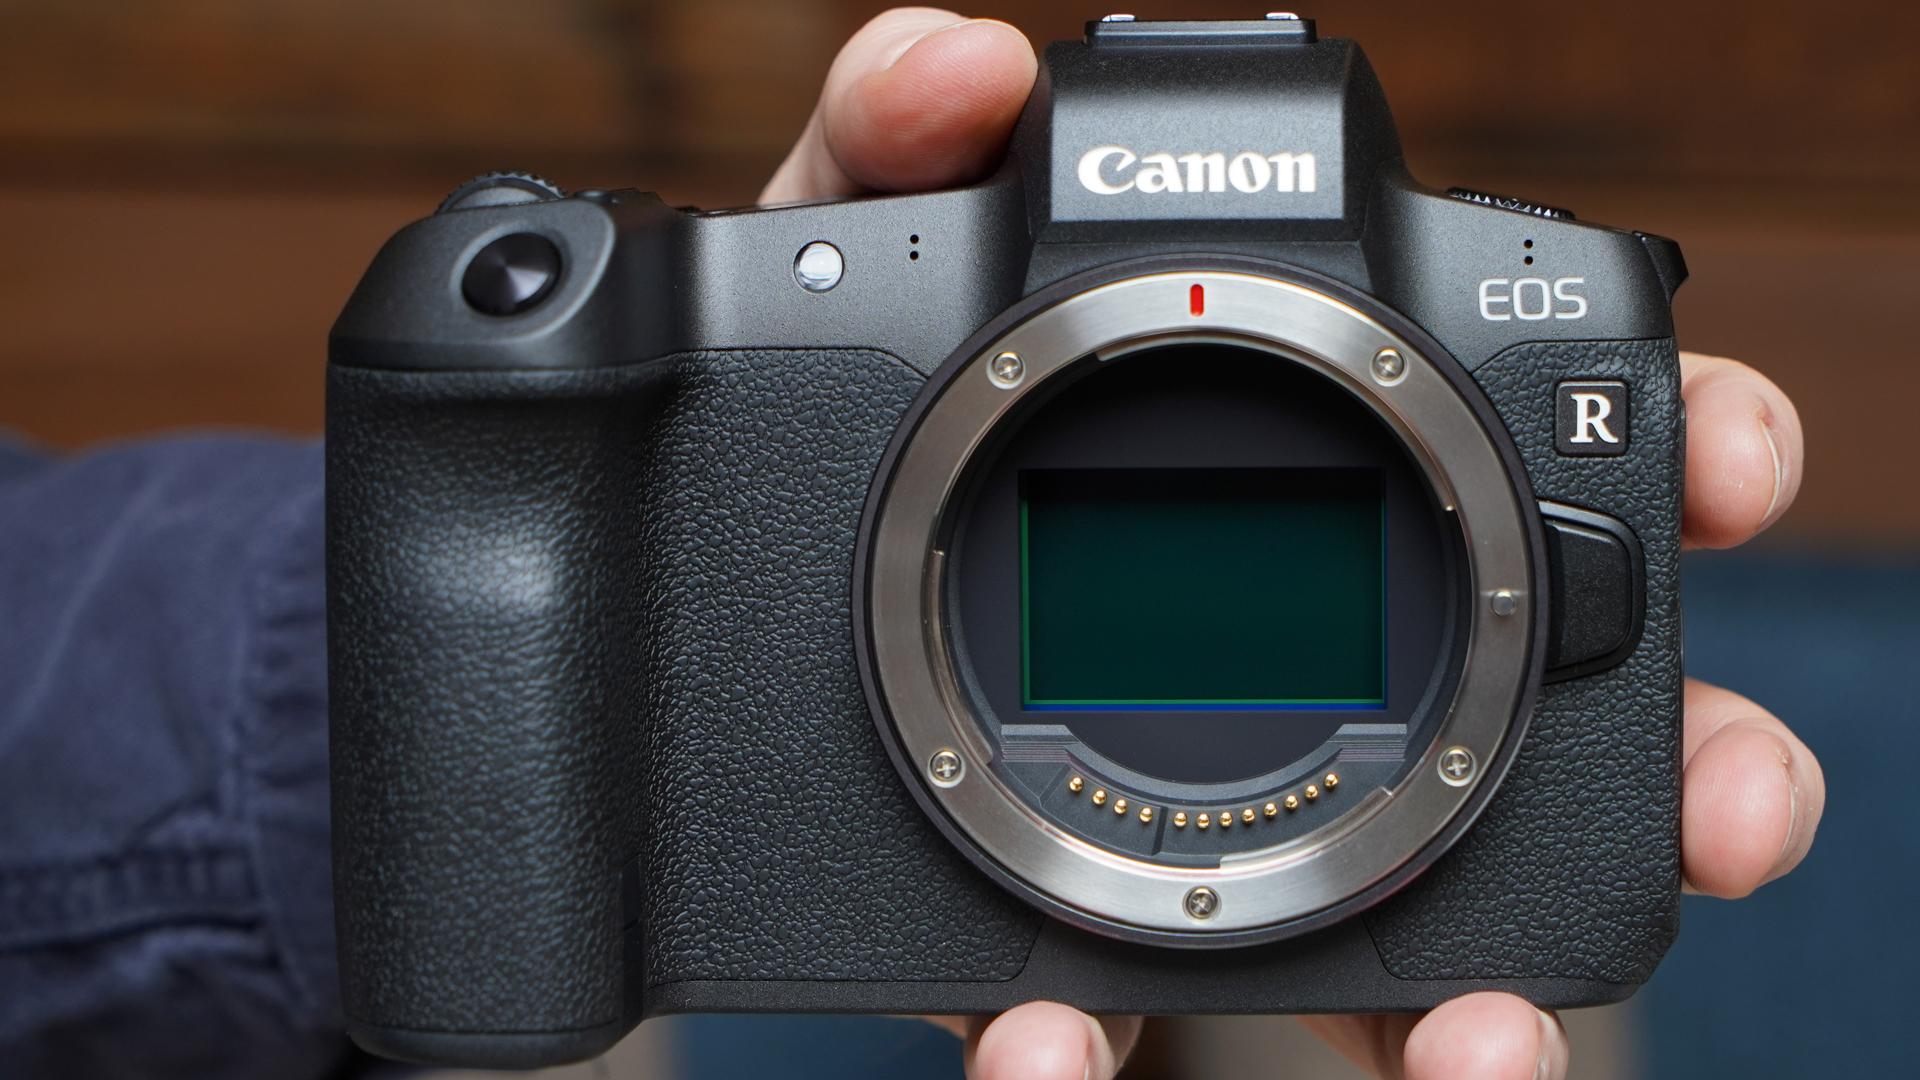 Best Mirrorless Camera 2020.83mp Canon Eos R Full Frame Mirrorless Camera Rumored To